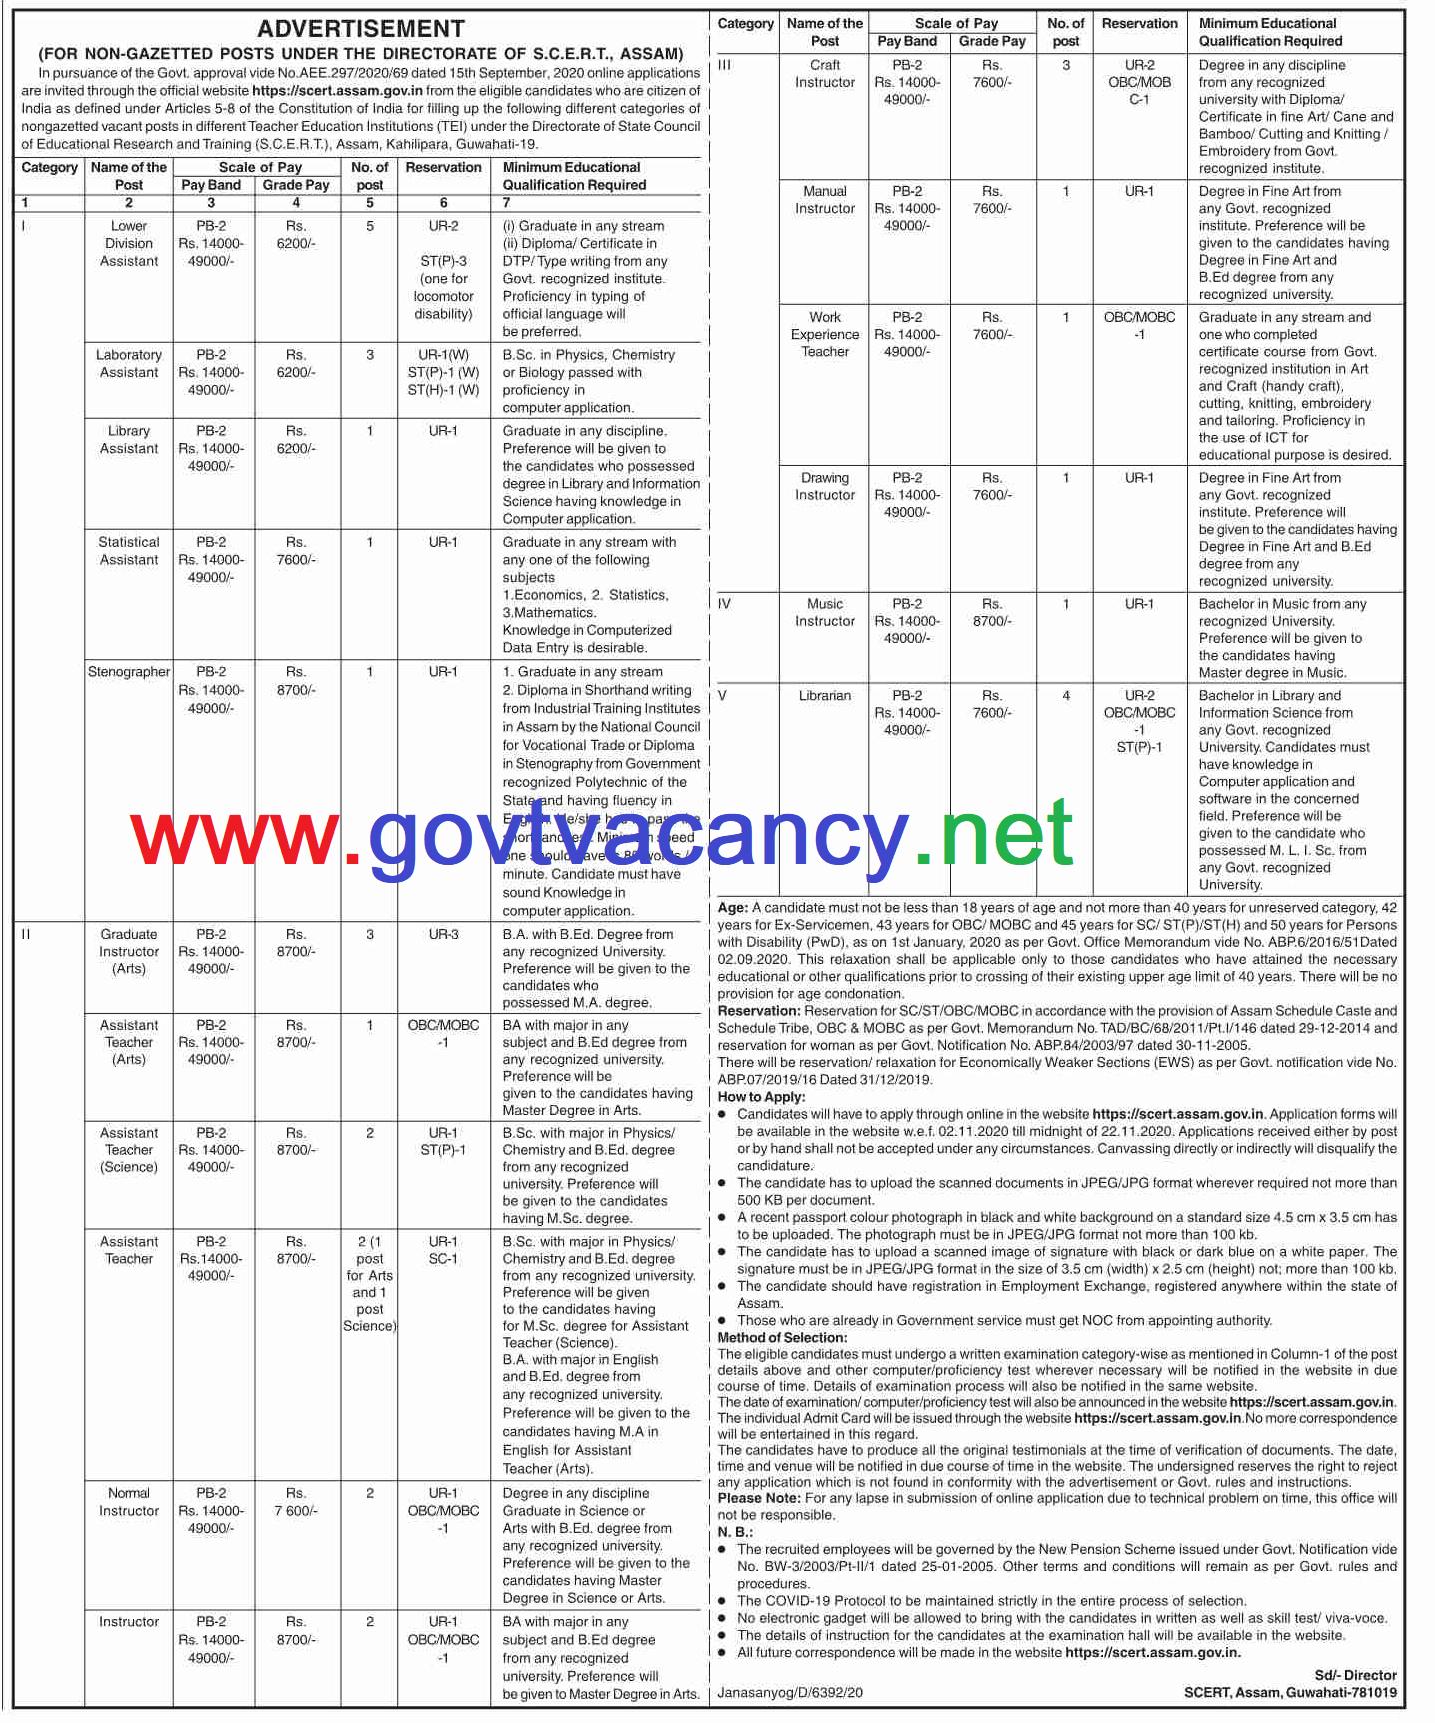 Latest govt vacancy in Assam, govt teacher job in assam, latest vacancy in assam for graduate, tgt teacher job in assam, assam teacher vacancy, govt teacher job for graduates and post graduate job in assam, assam govt job for teacher.